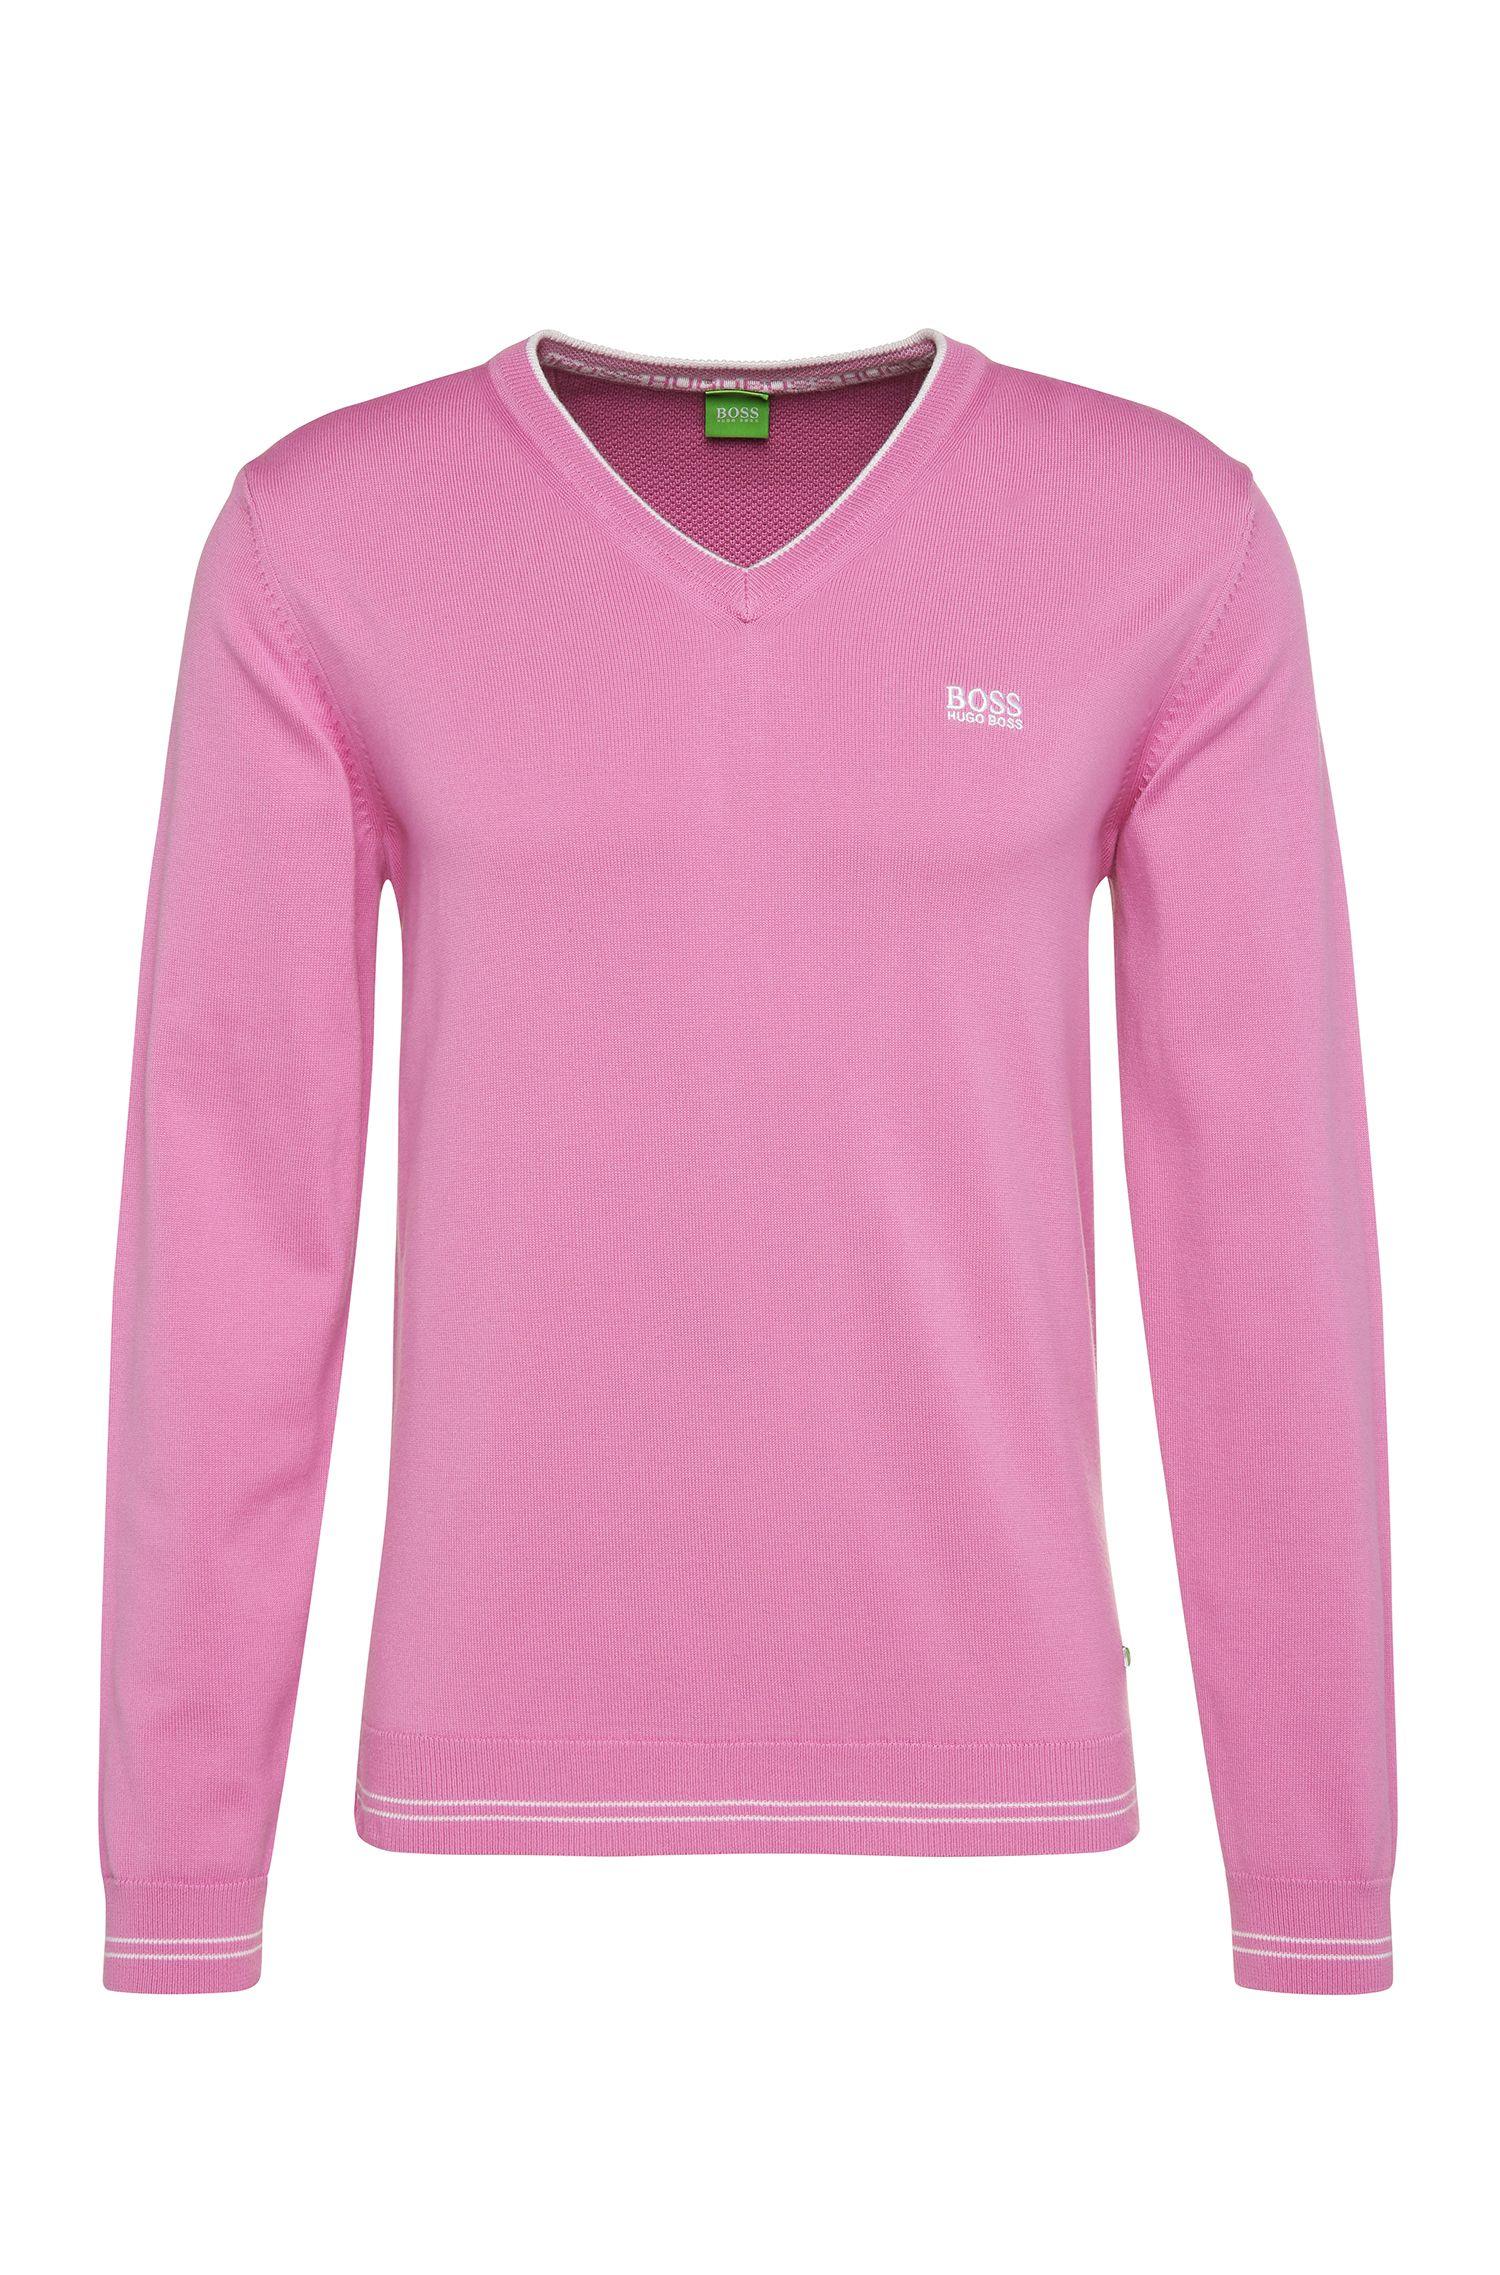 'Vime' | Cotton Blend Sweater